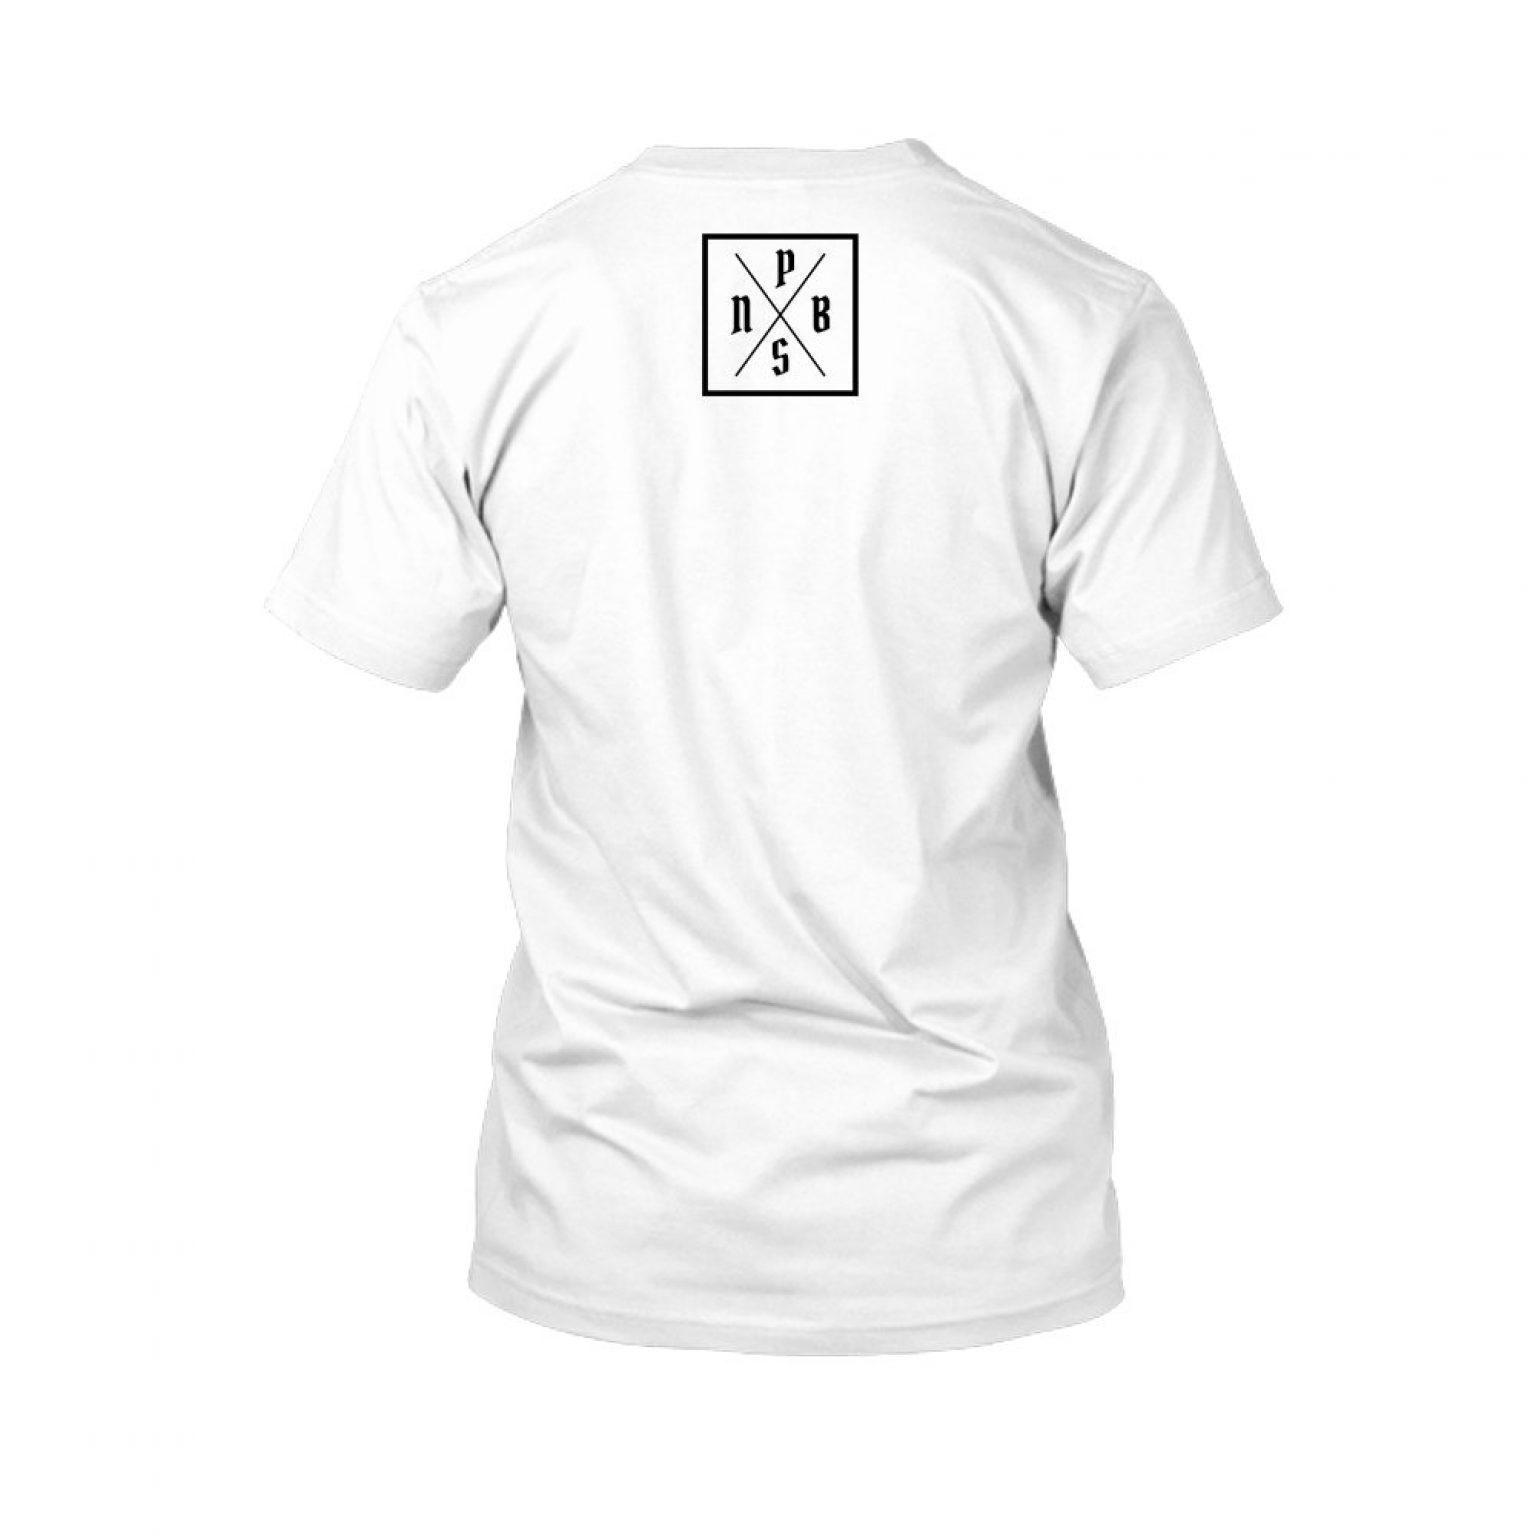 PBS shirt white back